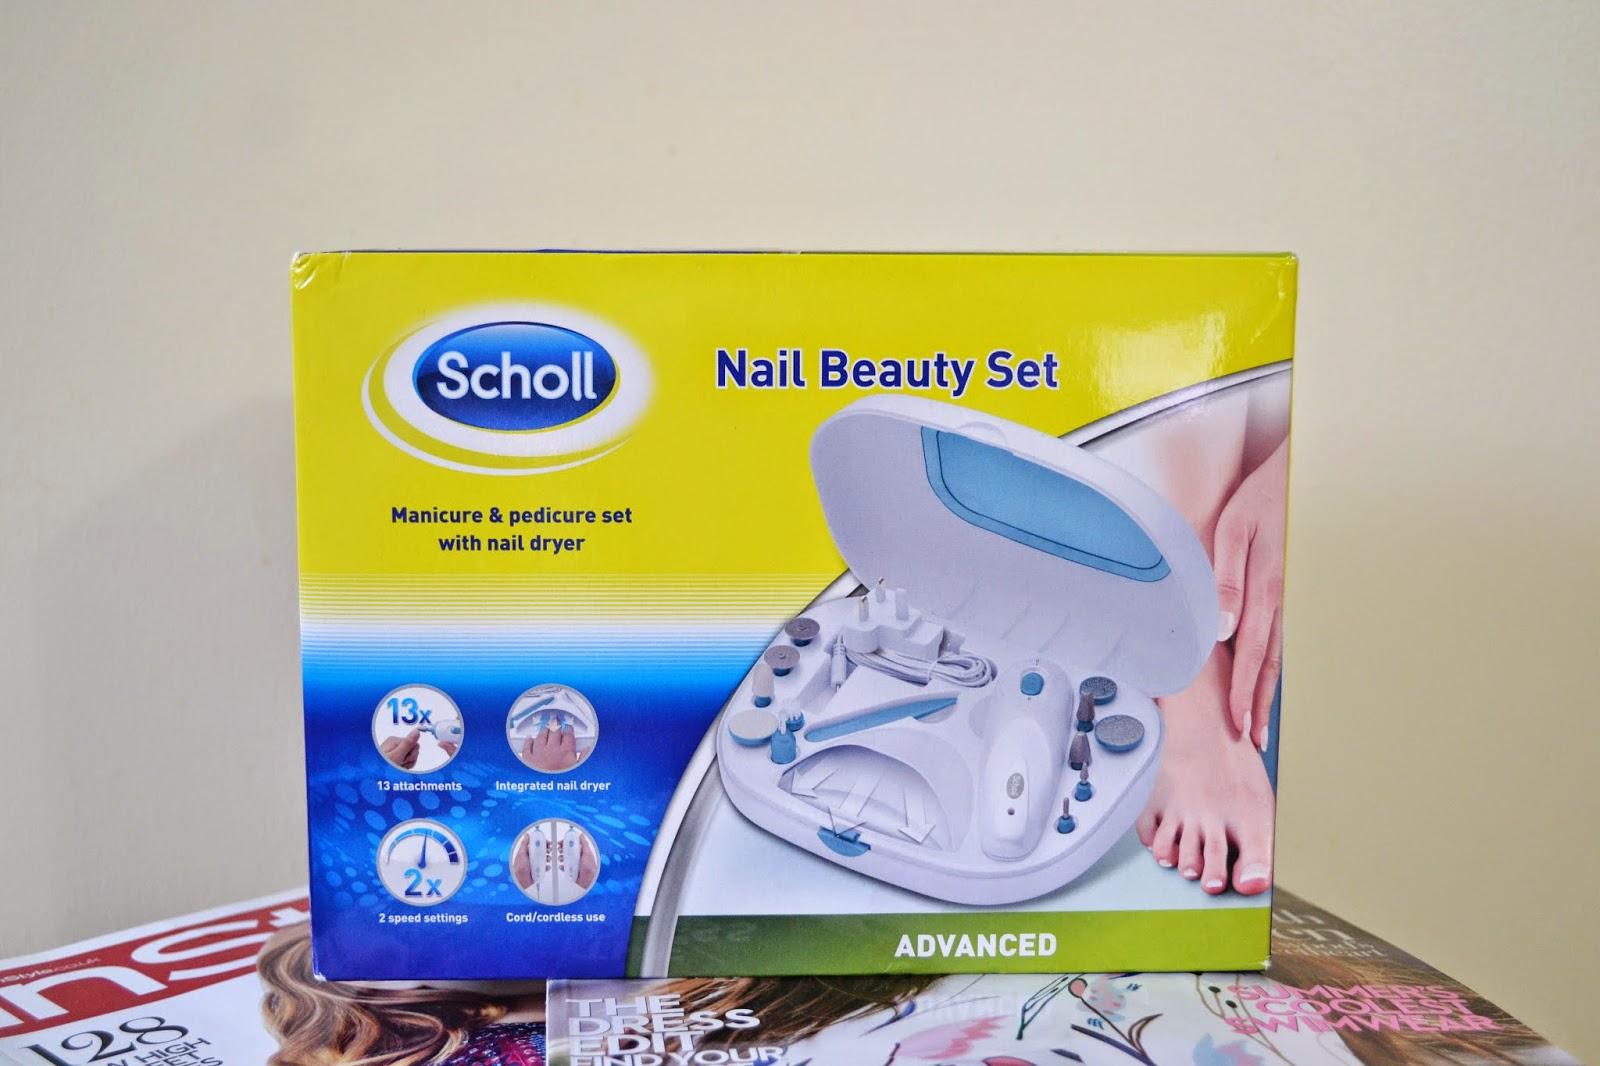 Scholl Manicure Pedicure Nail Beauty Set | Christmas Gift Guide #1 - Aspiring Londoner